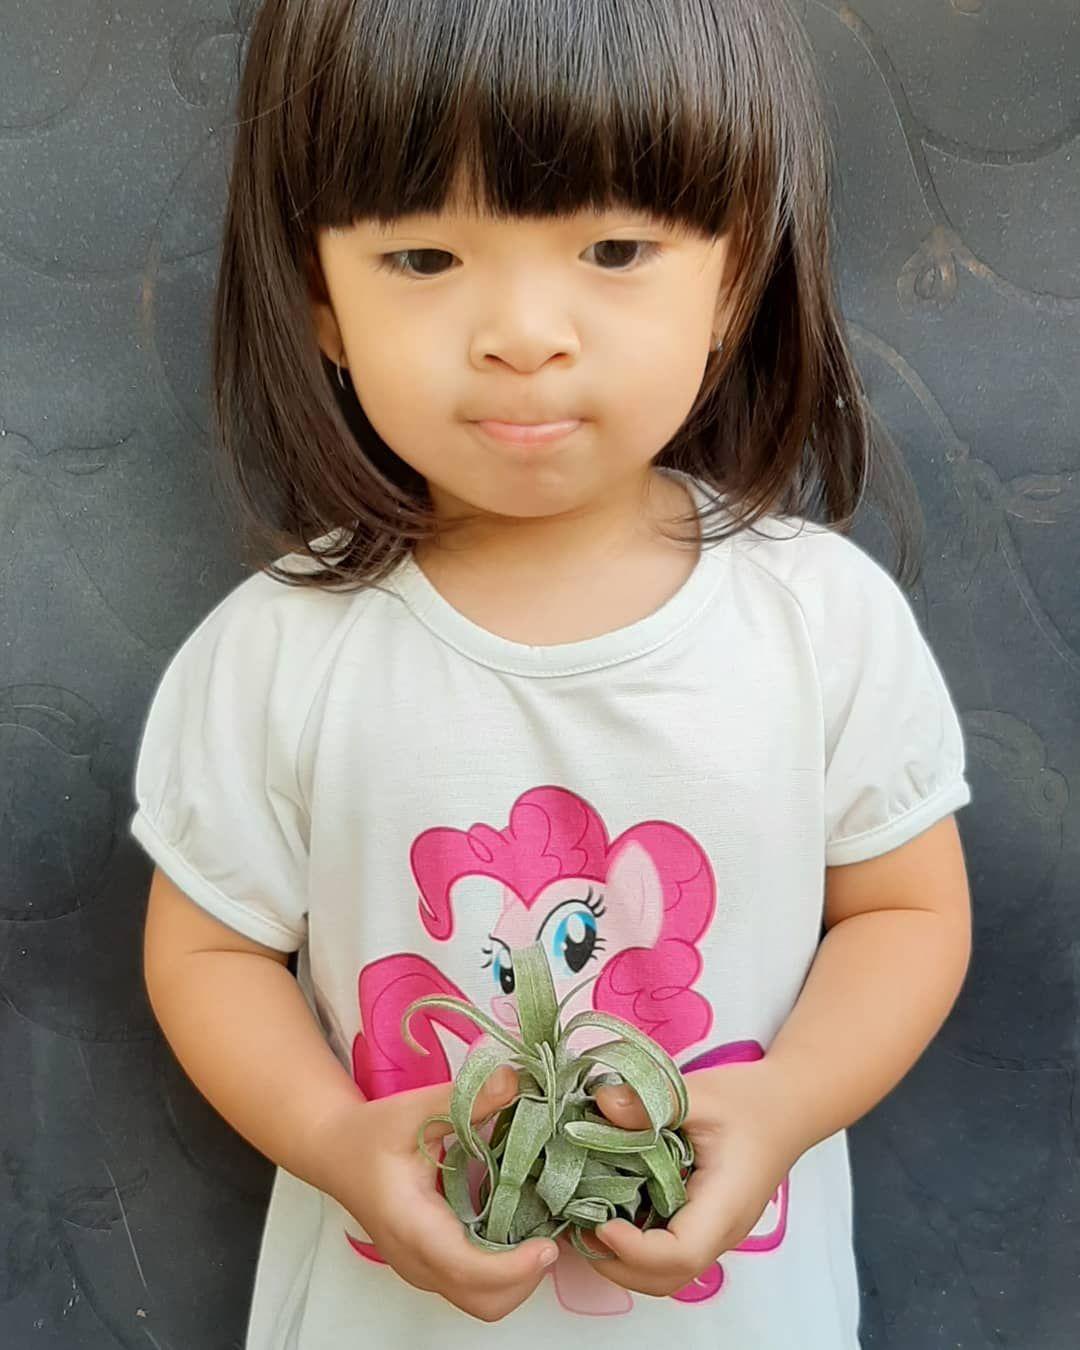 . . . . . #cutelittlegirls #tillandsiastreptophylla #tillandsia#airplants #trichomes#epiphyte #plantsofinstagram #plantsmakepeoplehappy #airplantsofinstagram #gardeningideas #urbangarden #tanamanudara #tanamanindoor #tillandsiaindonesia #tanamanunik #miniplants #tillandsiakarawang #tanamanhias #tanamanmasadepan